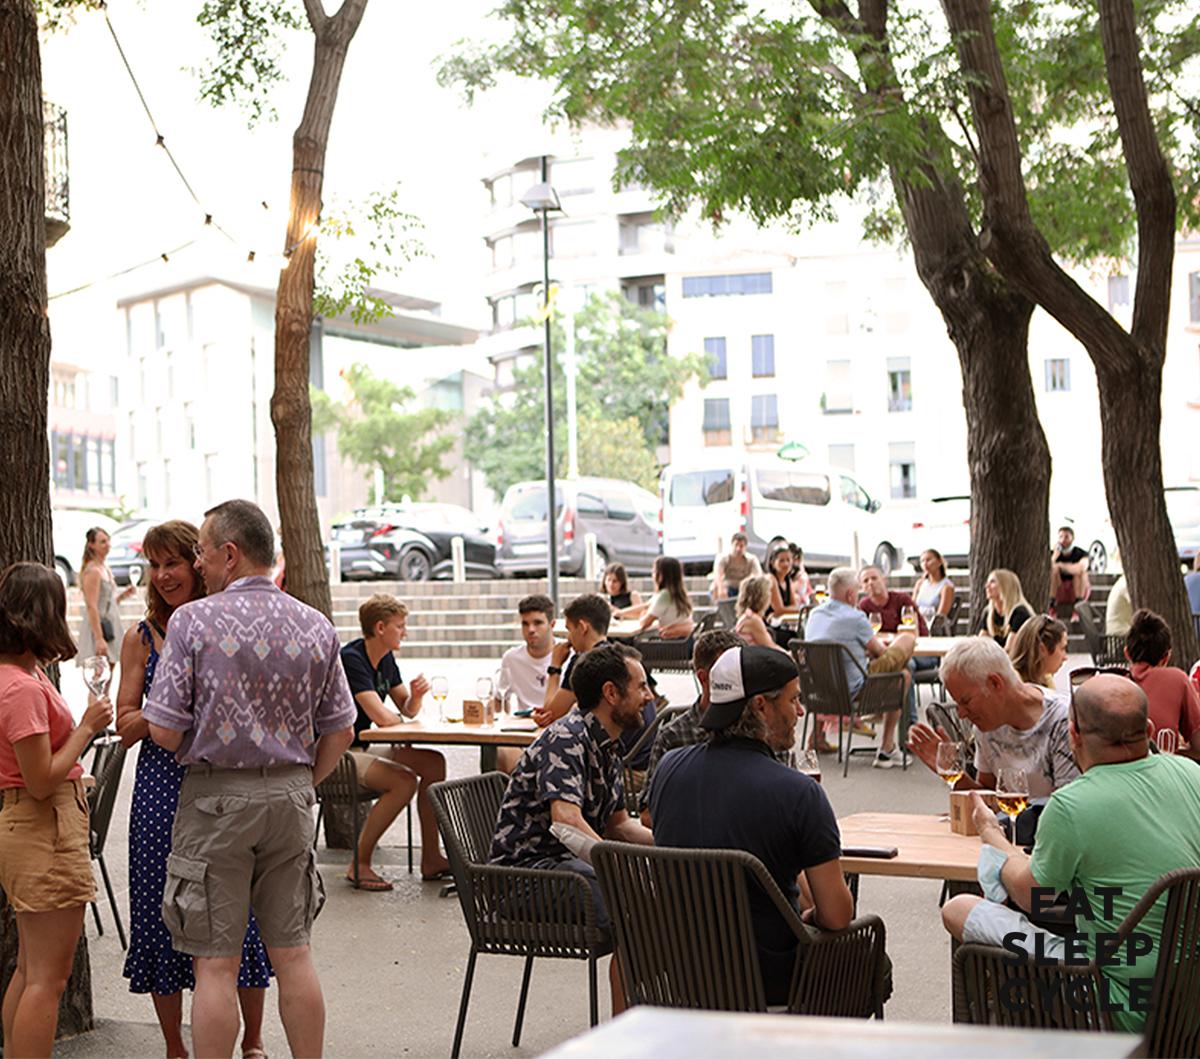 Eat-Sleep-Cycle-Hub-Cafe-Cycling-Cafe-Girona-Restaurant